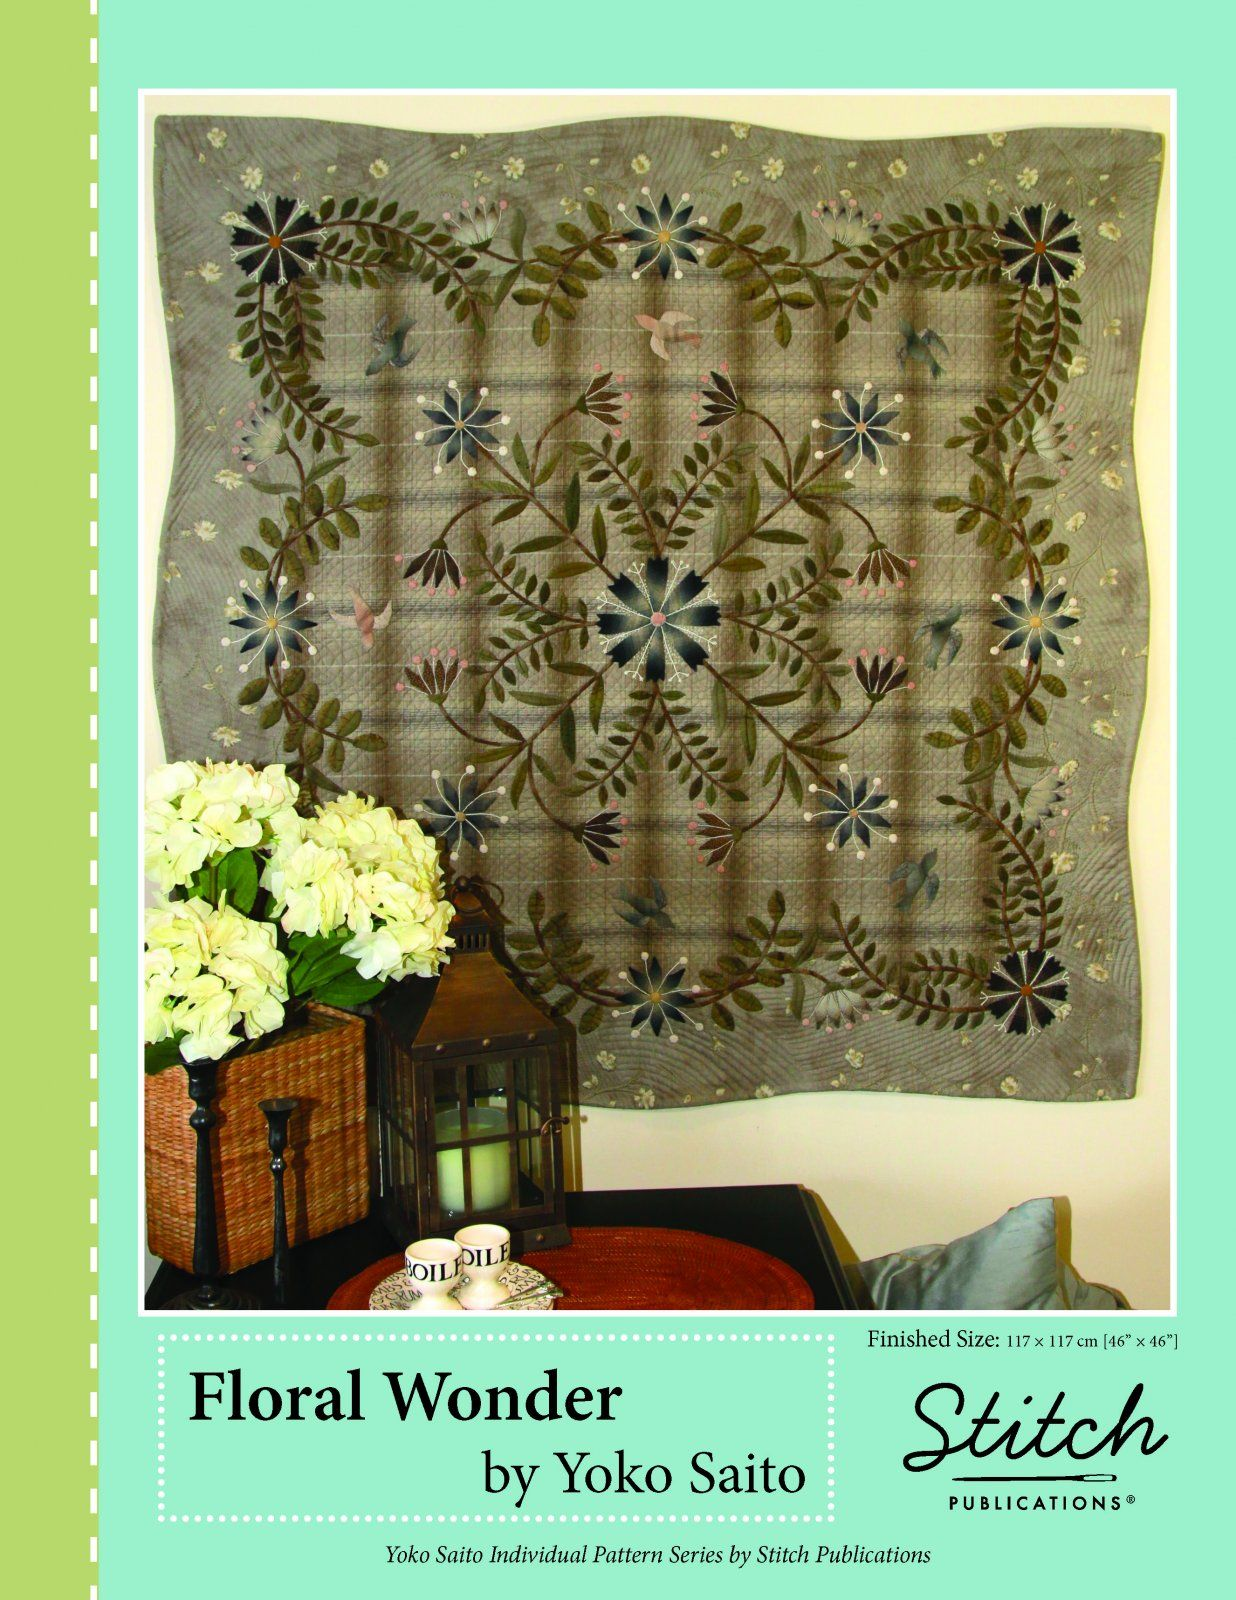 Floral Wonder by Yoko Saito   Quilts   Pinterest